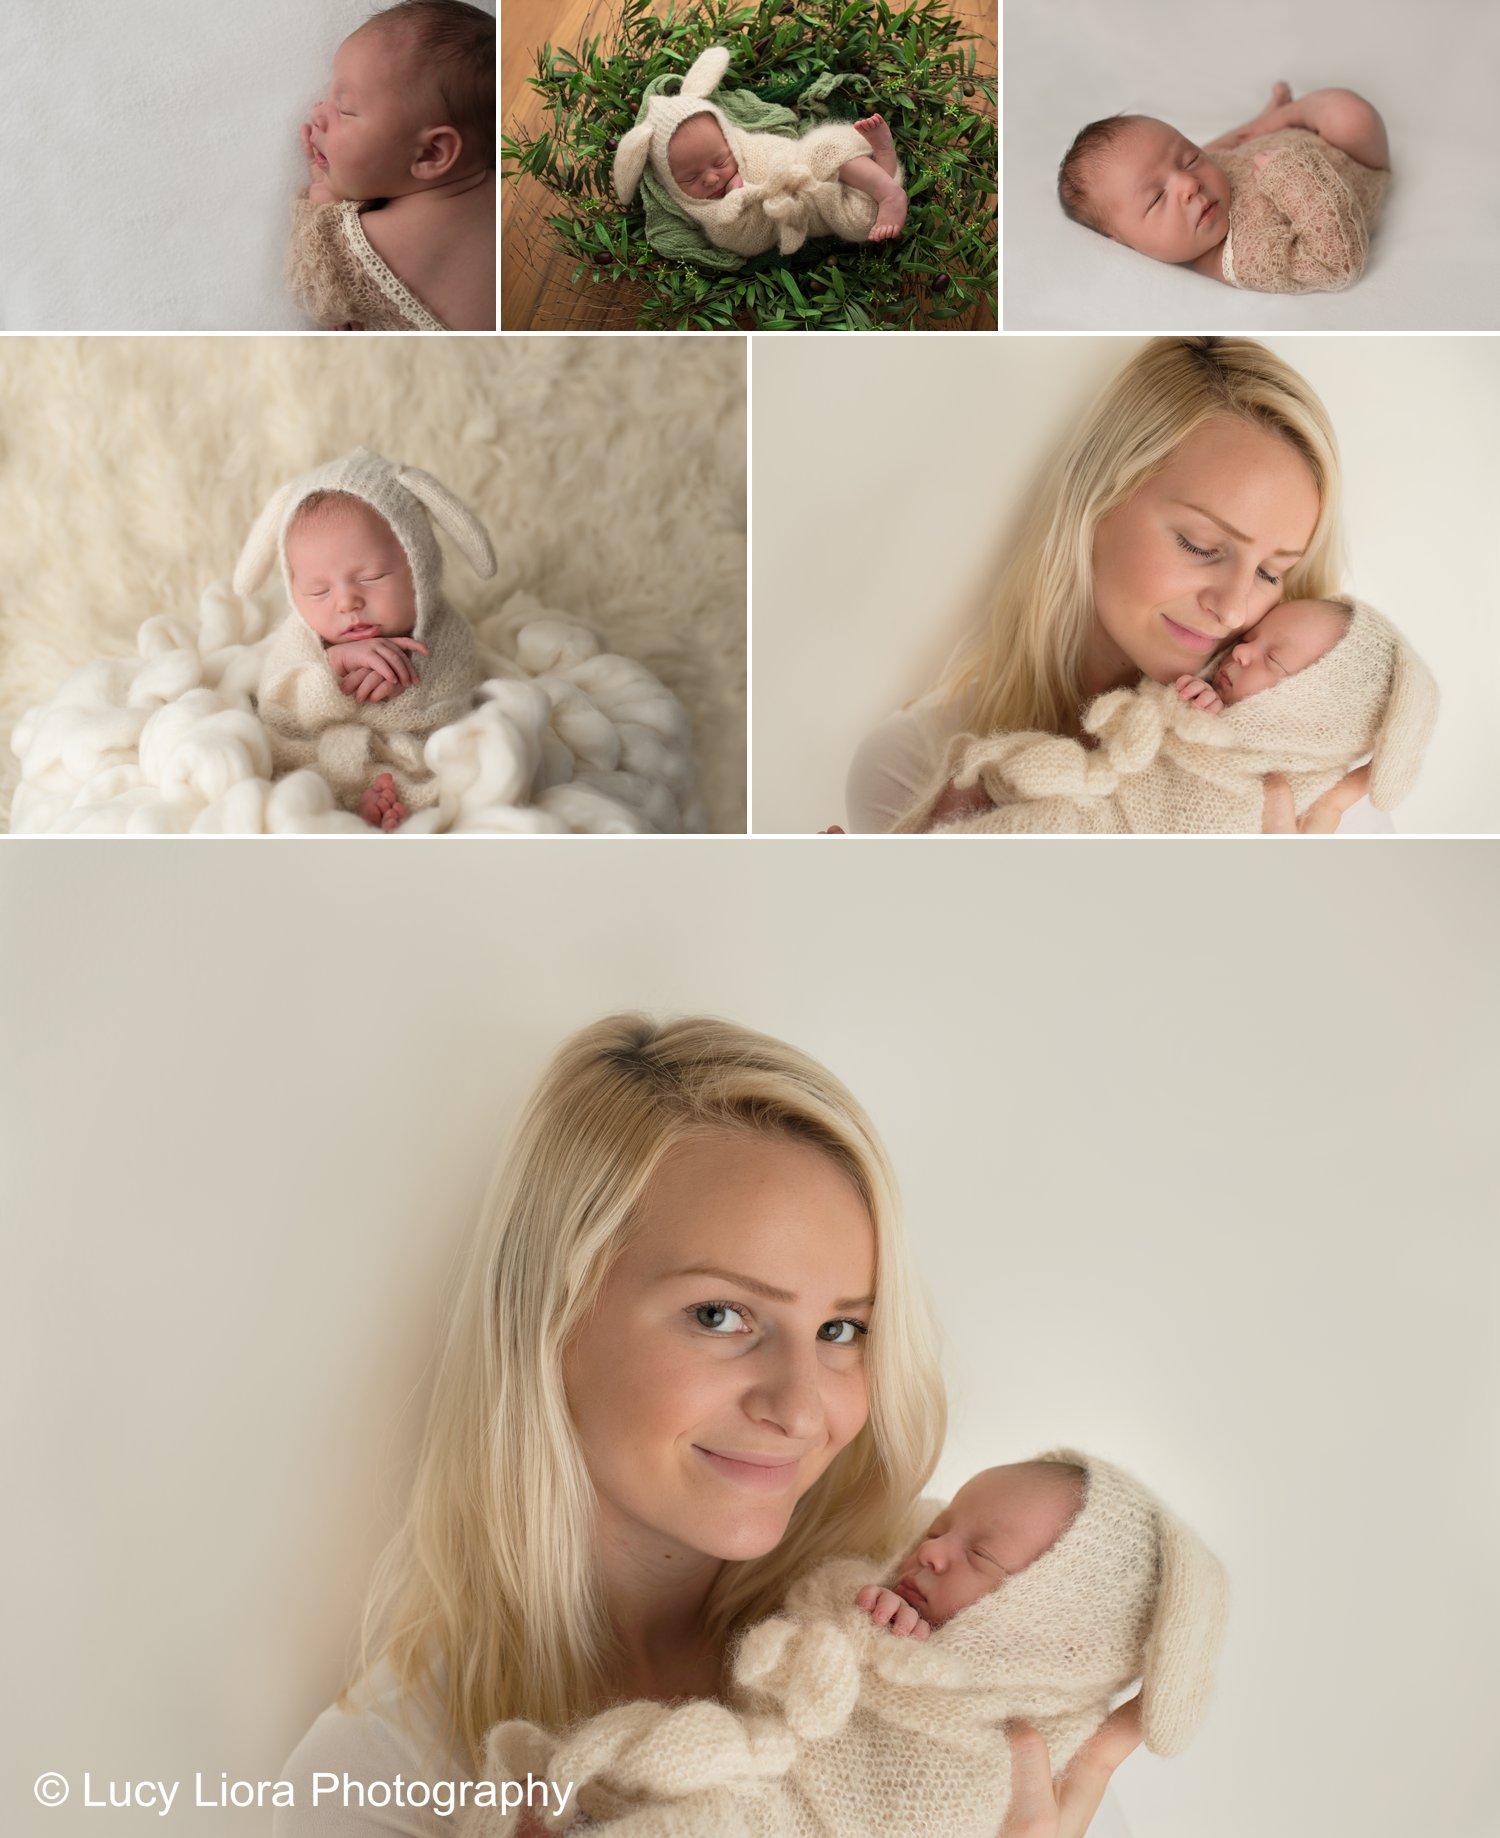 arcadia-boutique-newborn-photography-minime